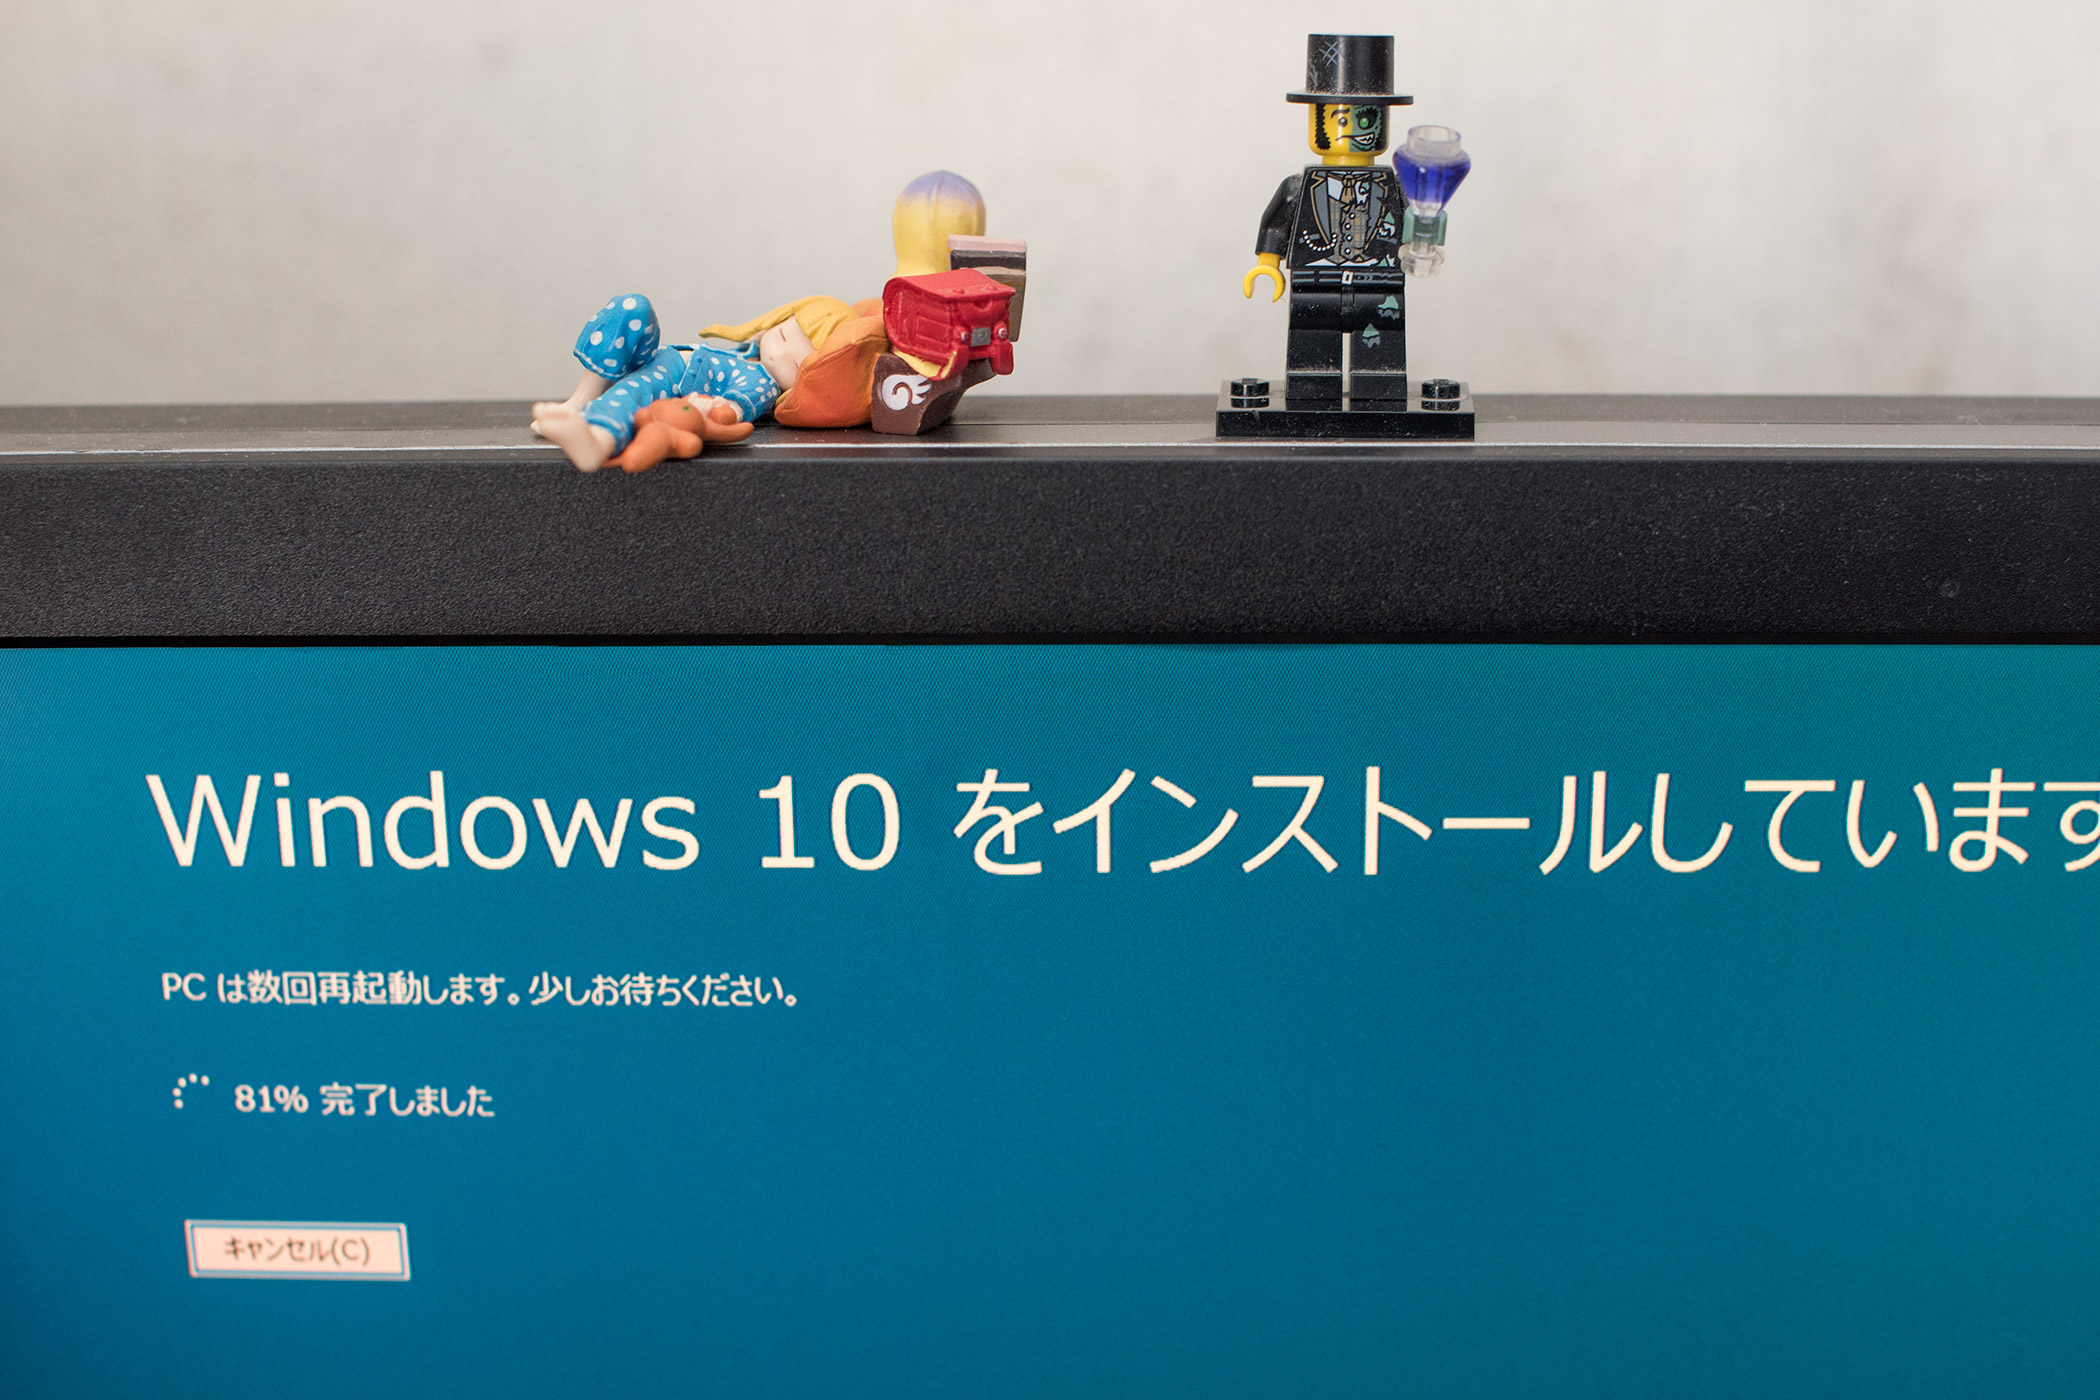 Windows10Pro インストール作業中